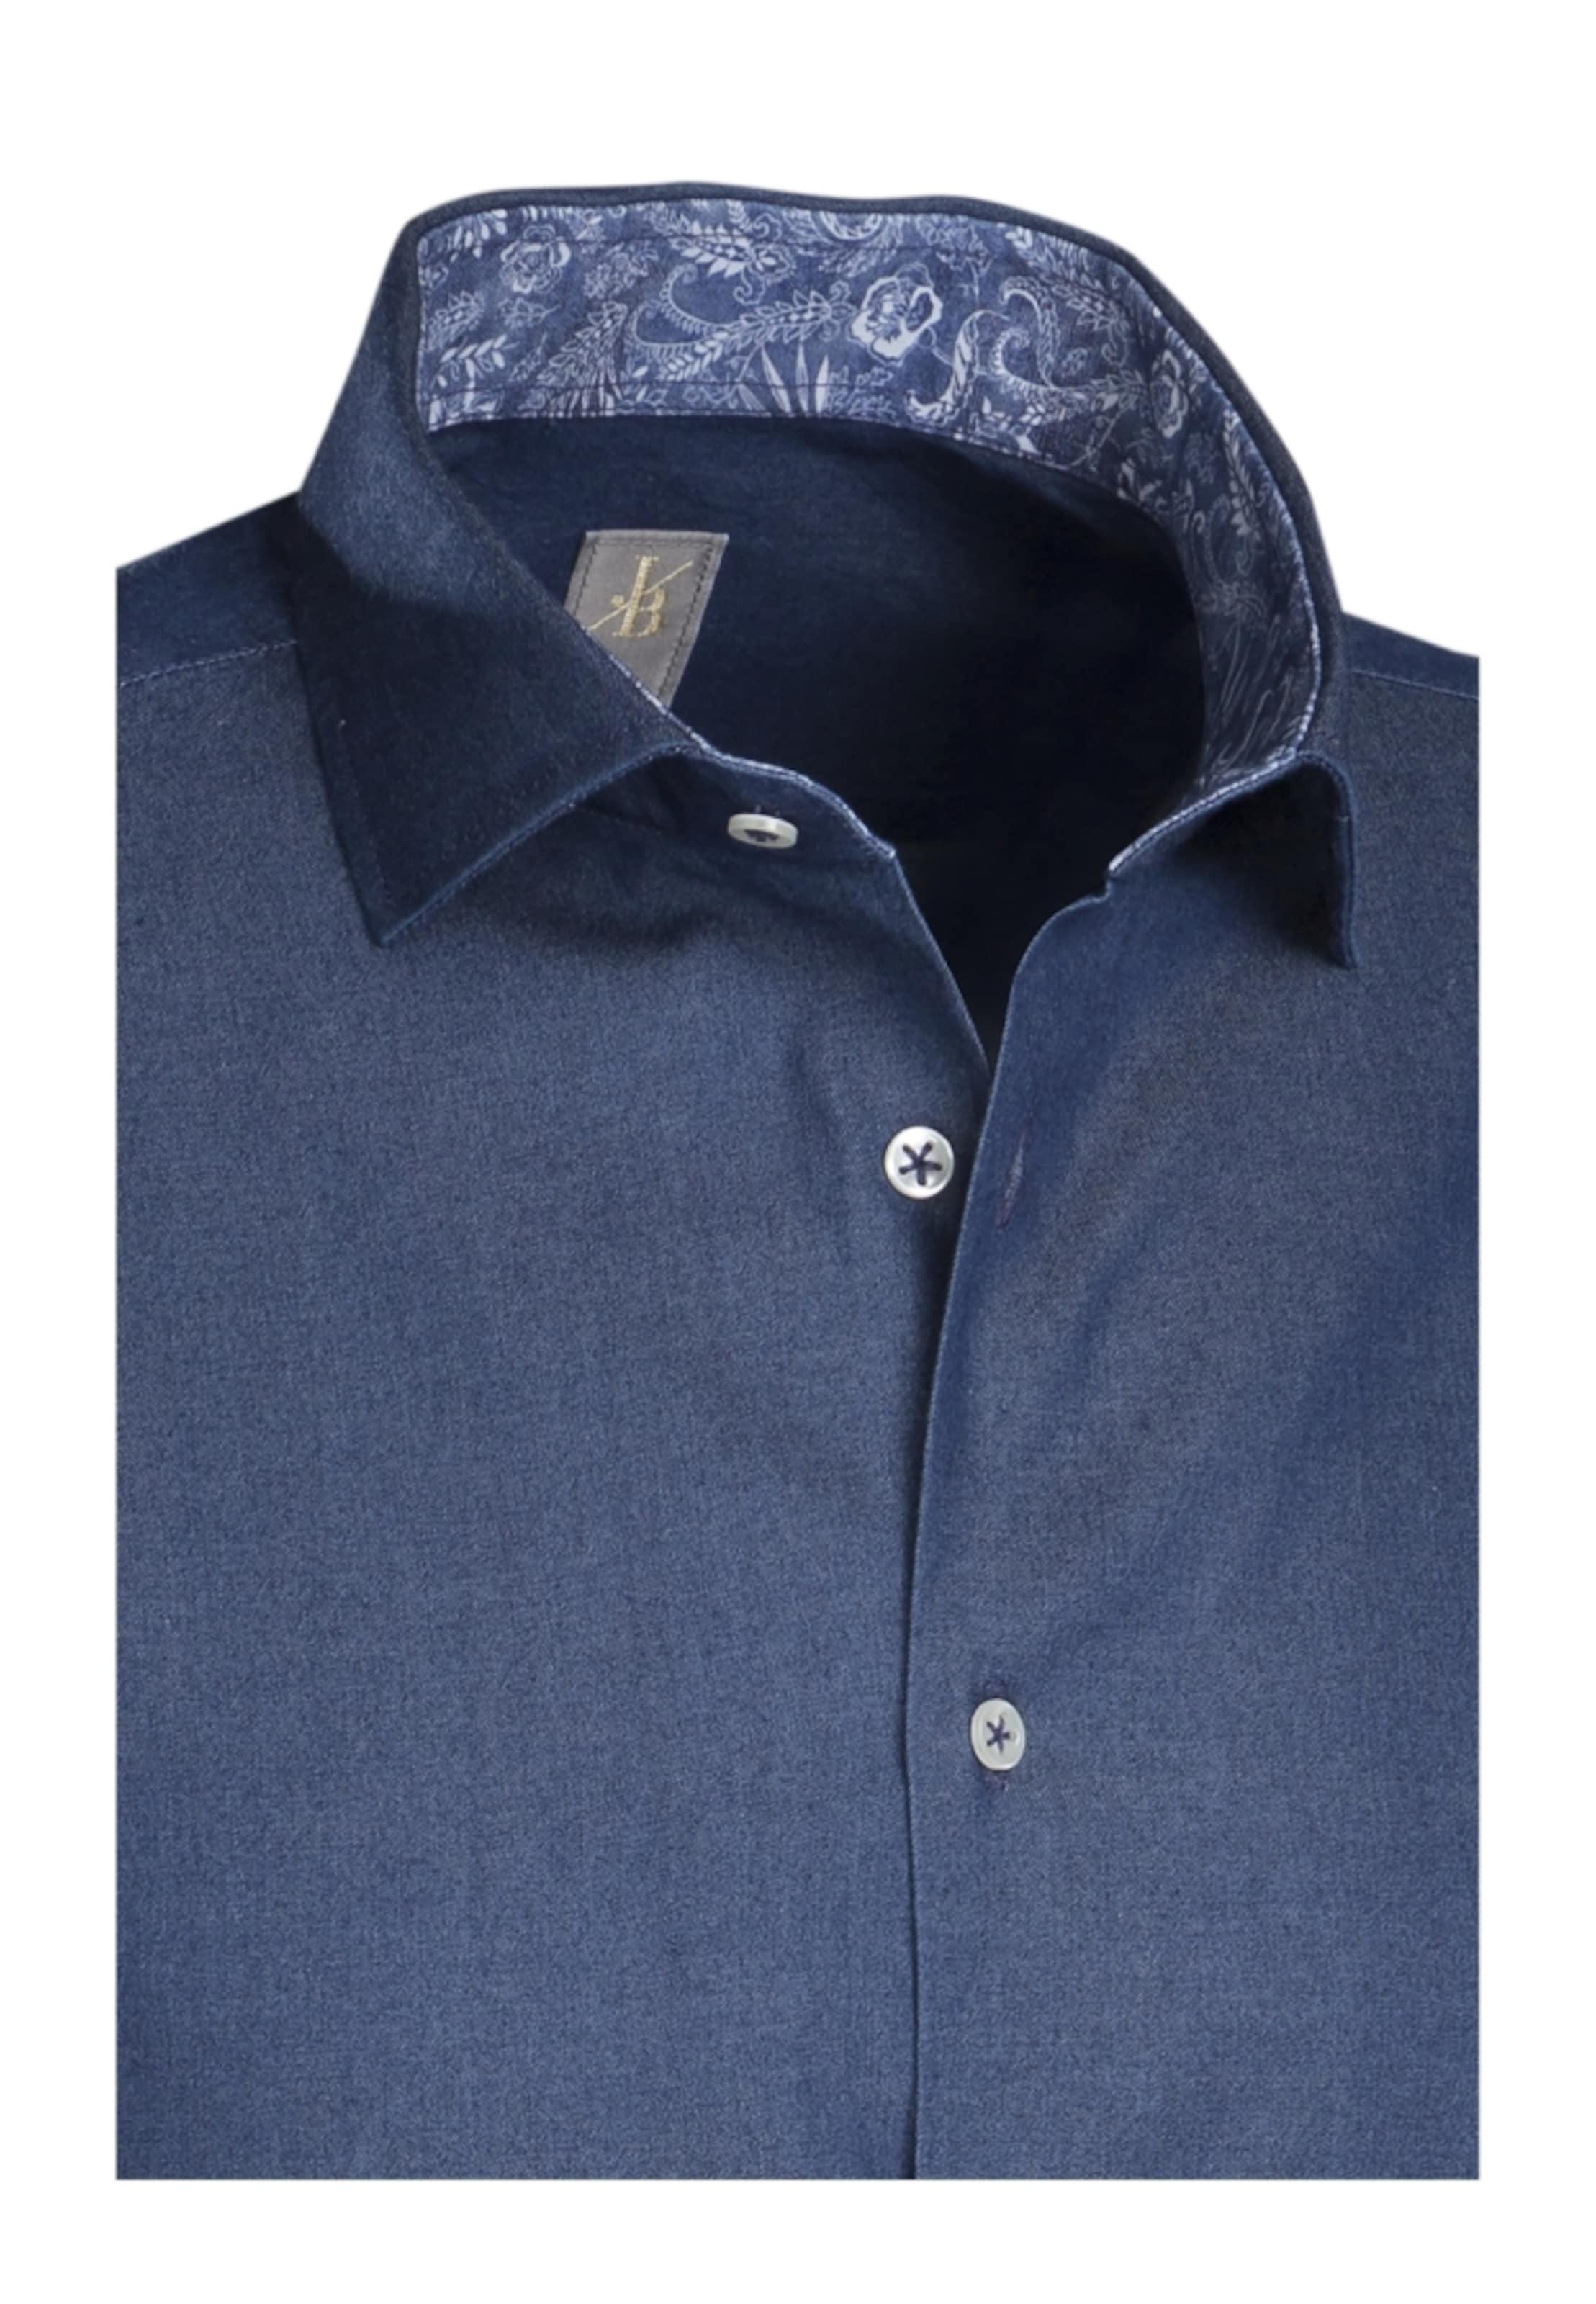 Casual hemd Jacques ' Slim In Blau Fit Britt uFKlc5JT13